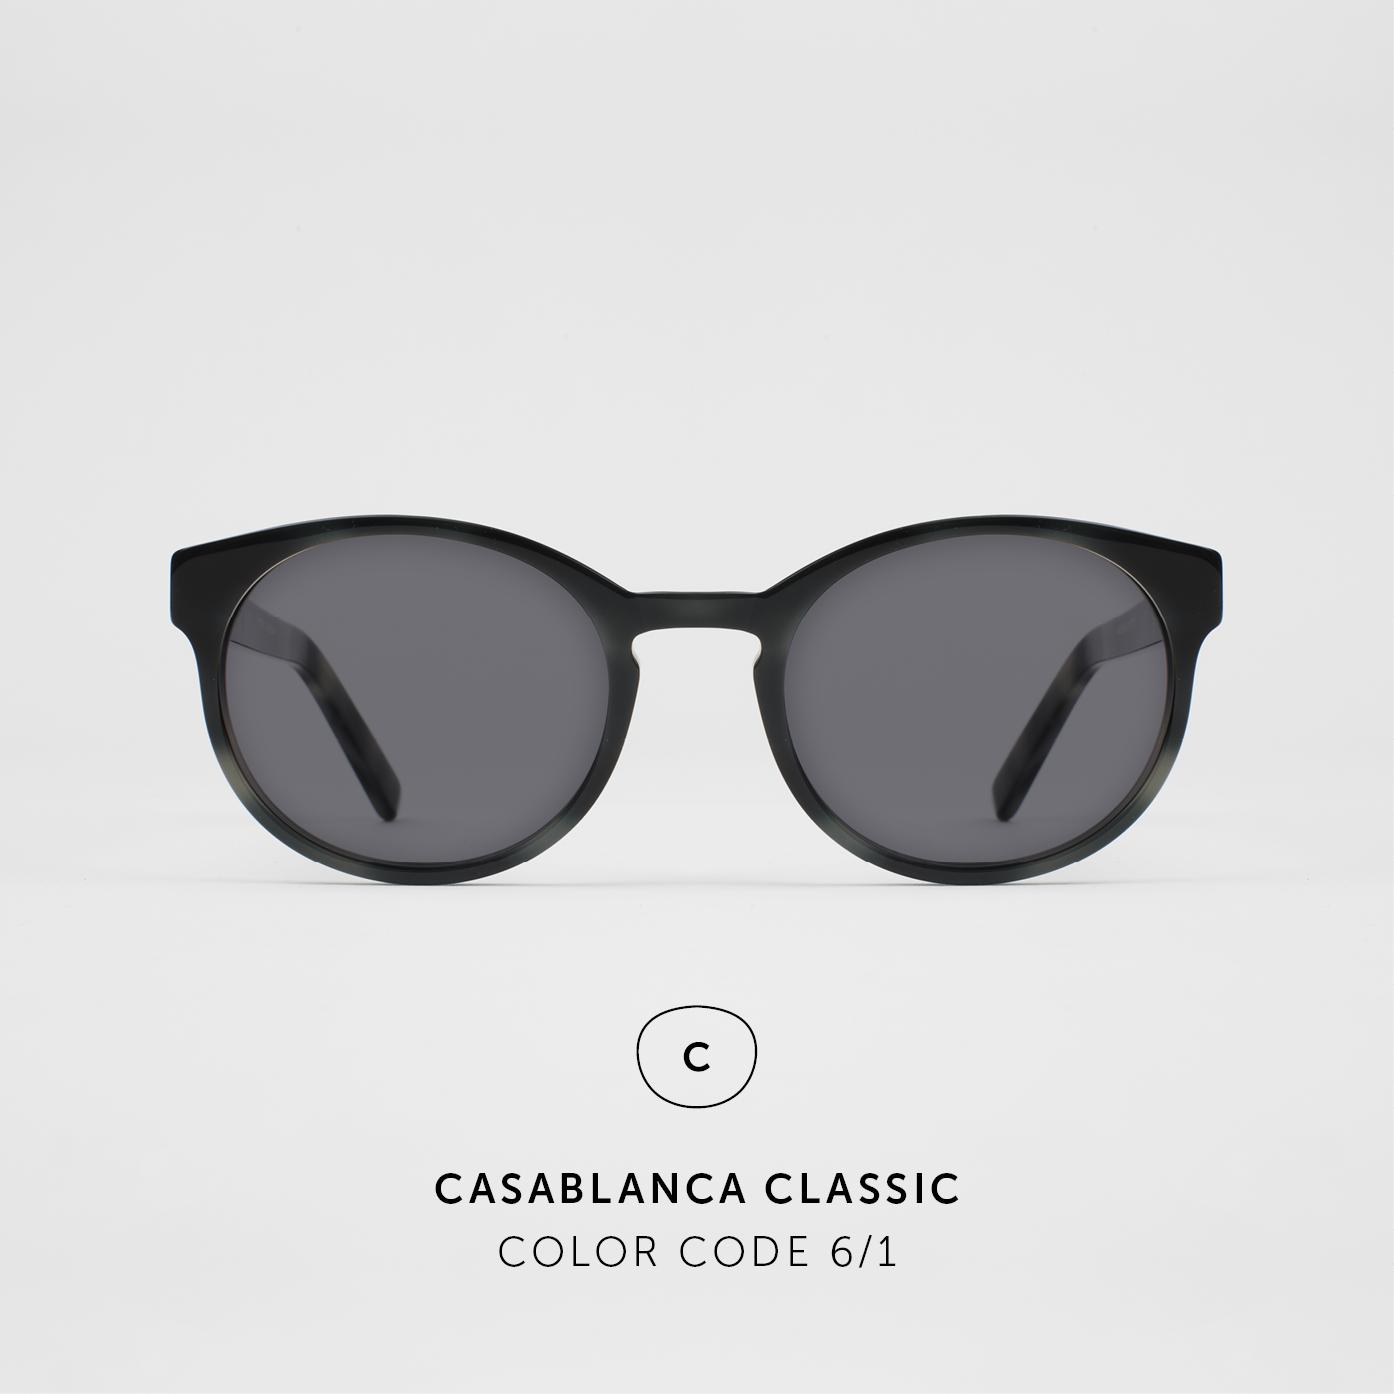 CasablancaClassic26.jpg